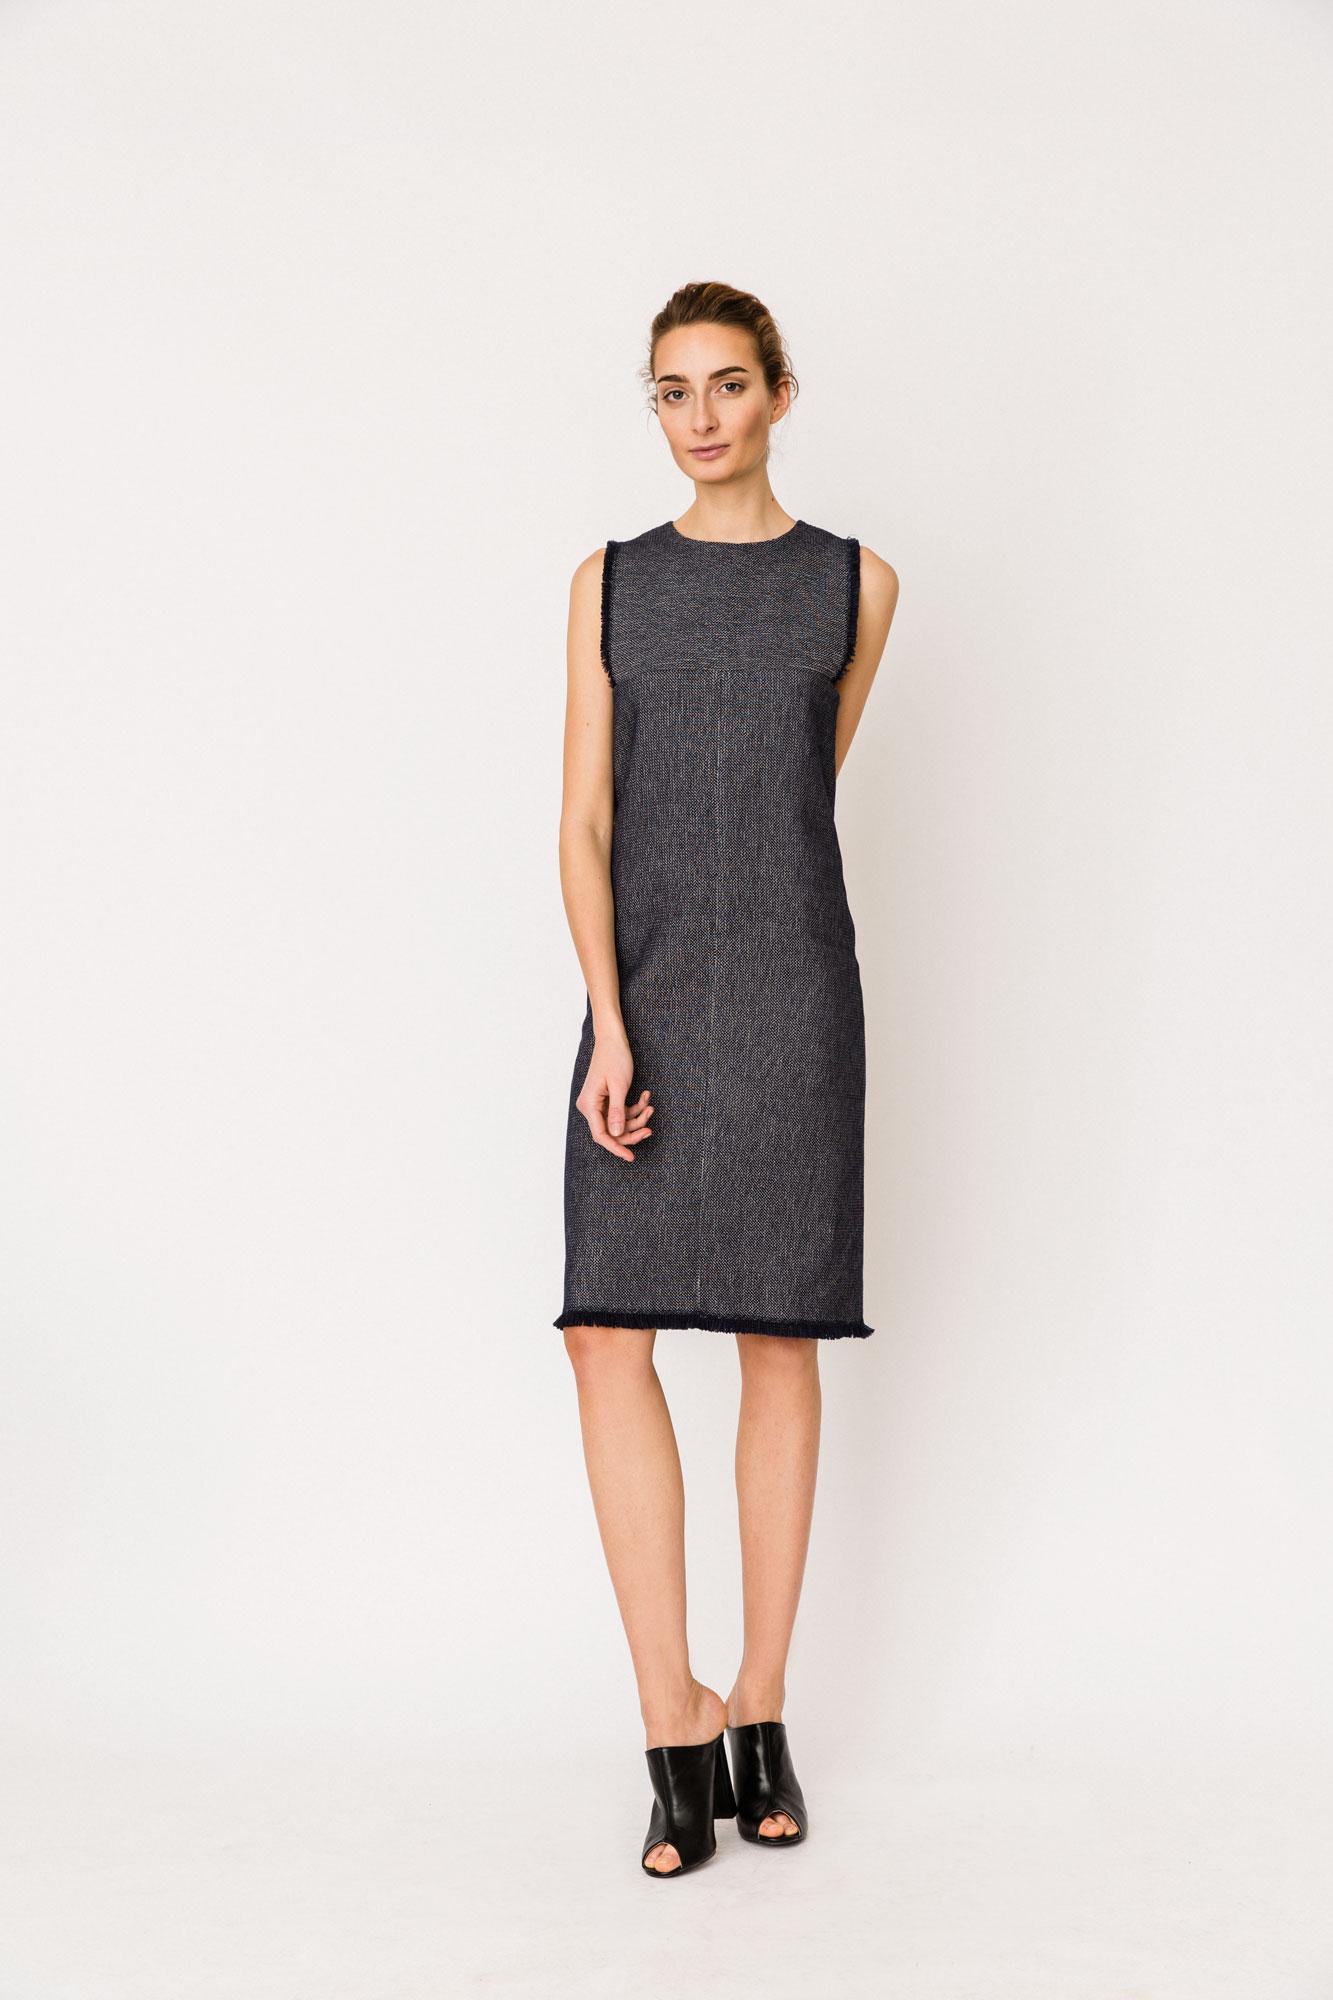 S18-09Plica_Dress3